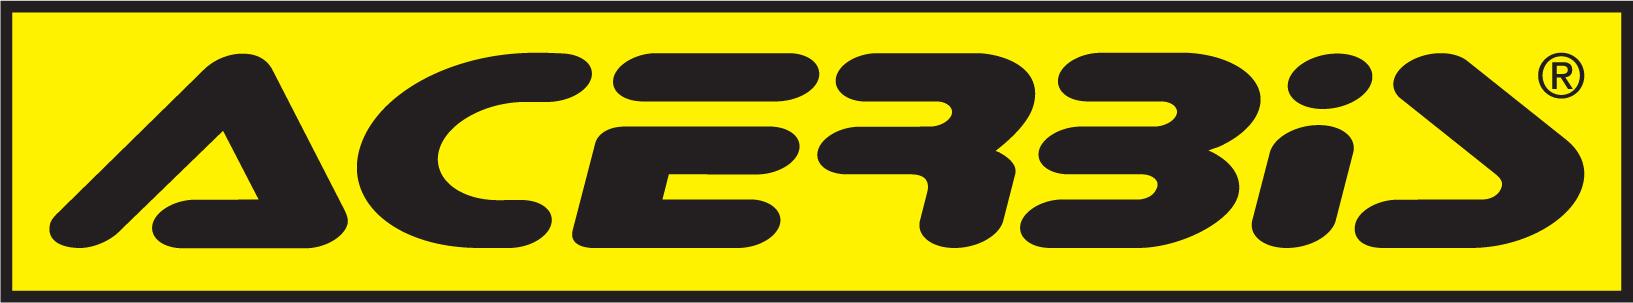 Acerbis - Acerbis Moto Logo PNG